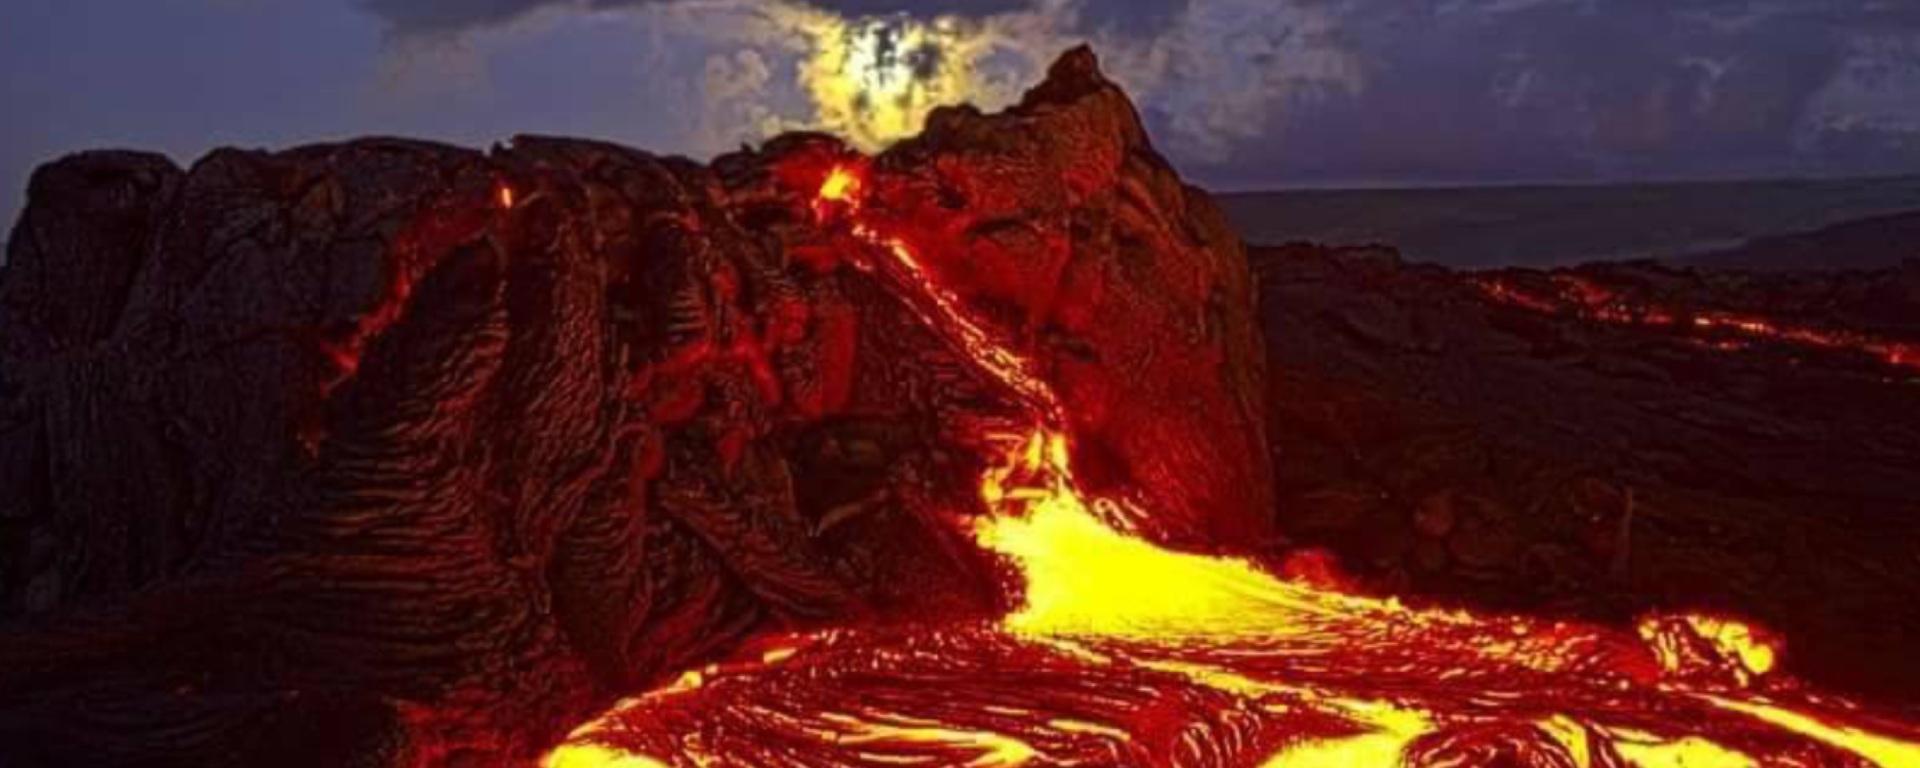 Hawaii Volcano Demon revealed  – yhebrew com……  'Hand of יהוה